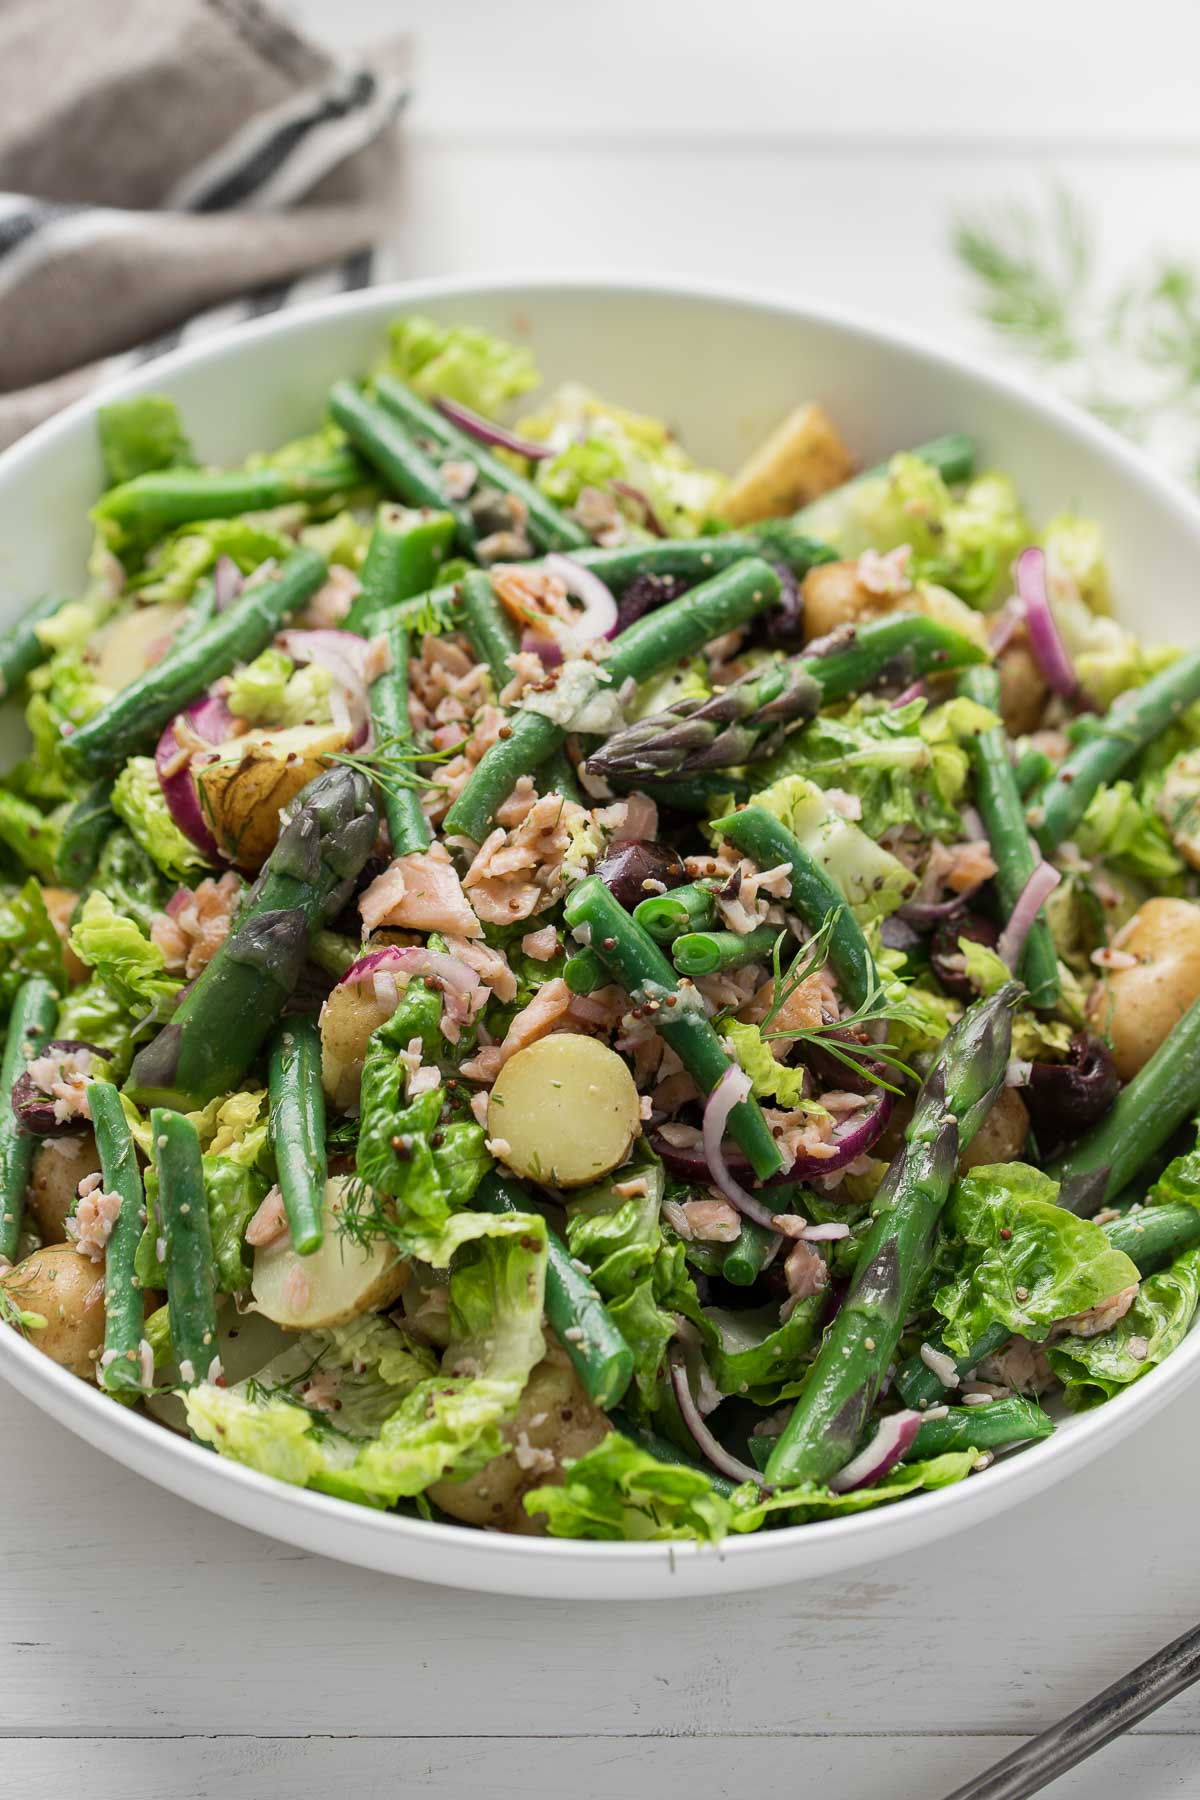 Warm Potato Niçoise Salad with Smoked Salmon